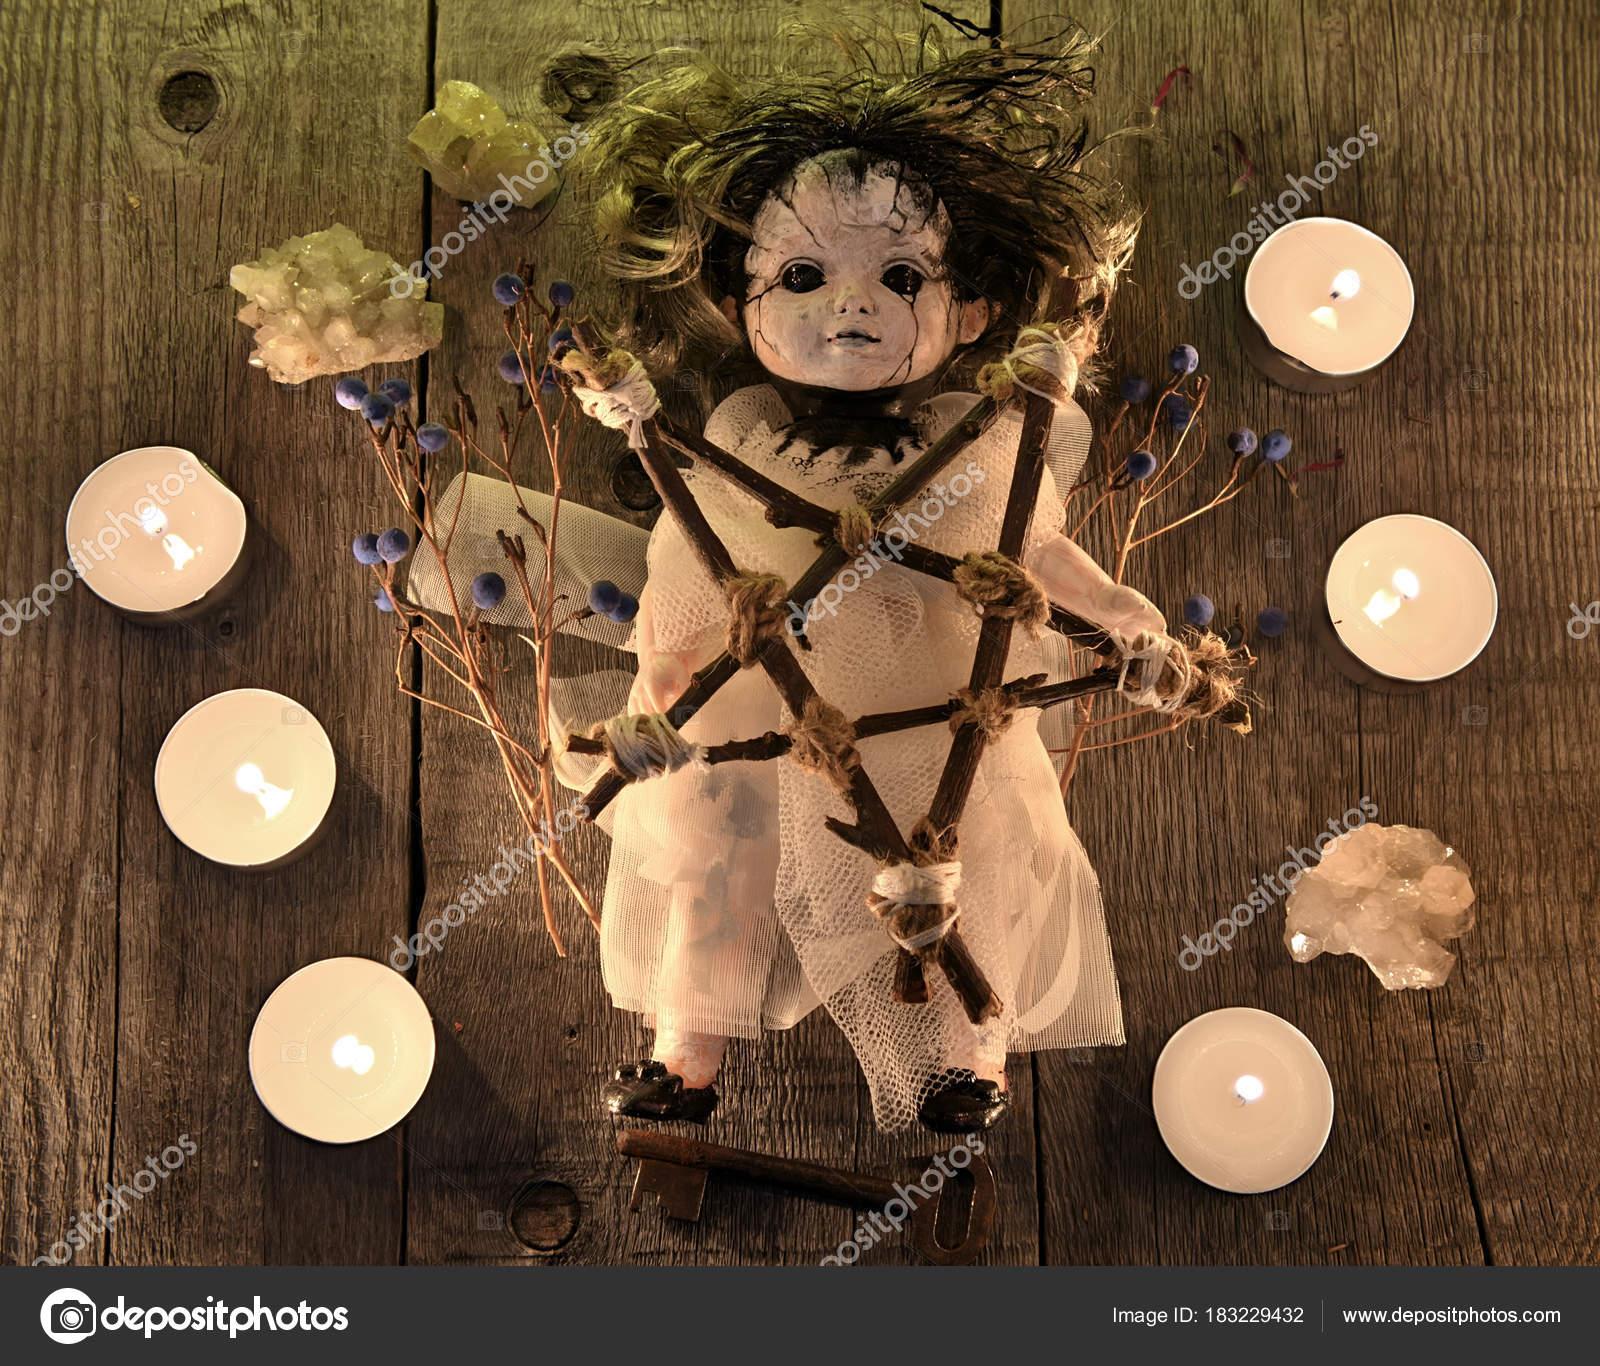 Beängstigend Voodoo Puppe Mit Kerzen Pentagramm Und Vergiften Beeren ...